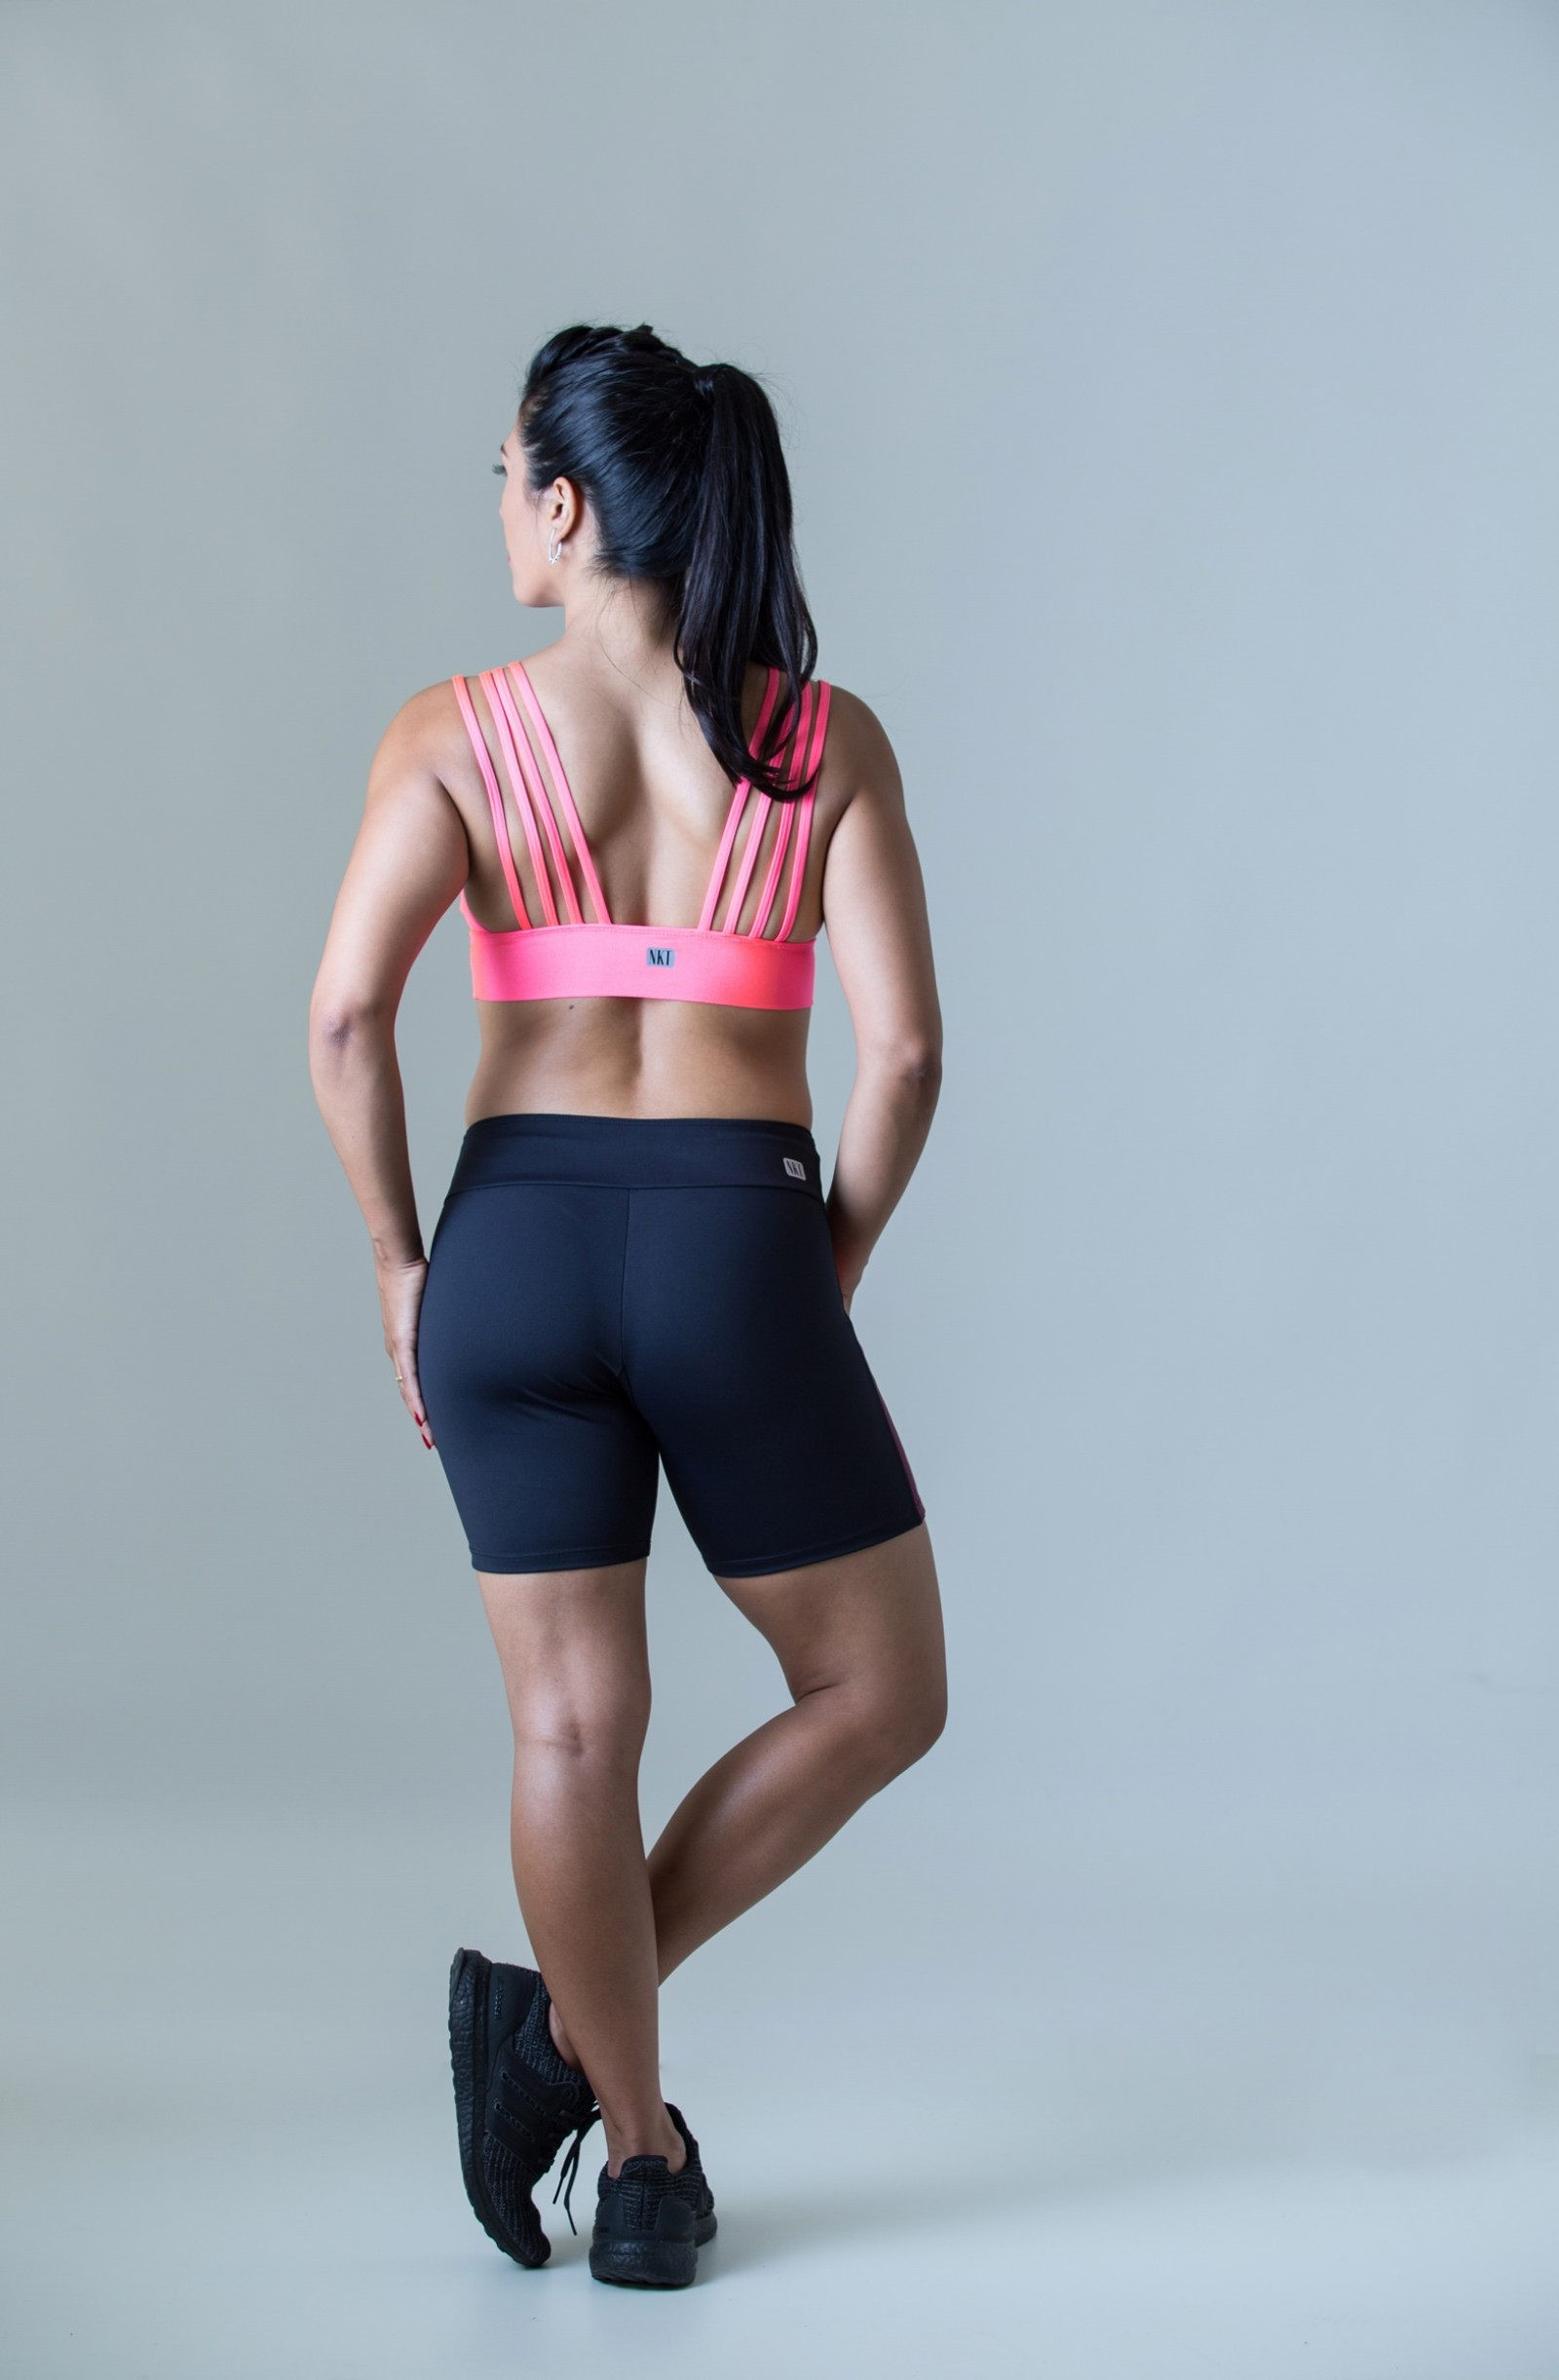 Top Fun Glow, Coleção Plenitude - NKT Fitwear Moda Fitness